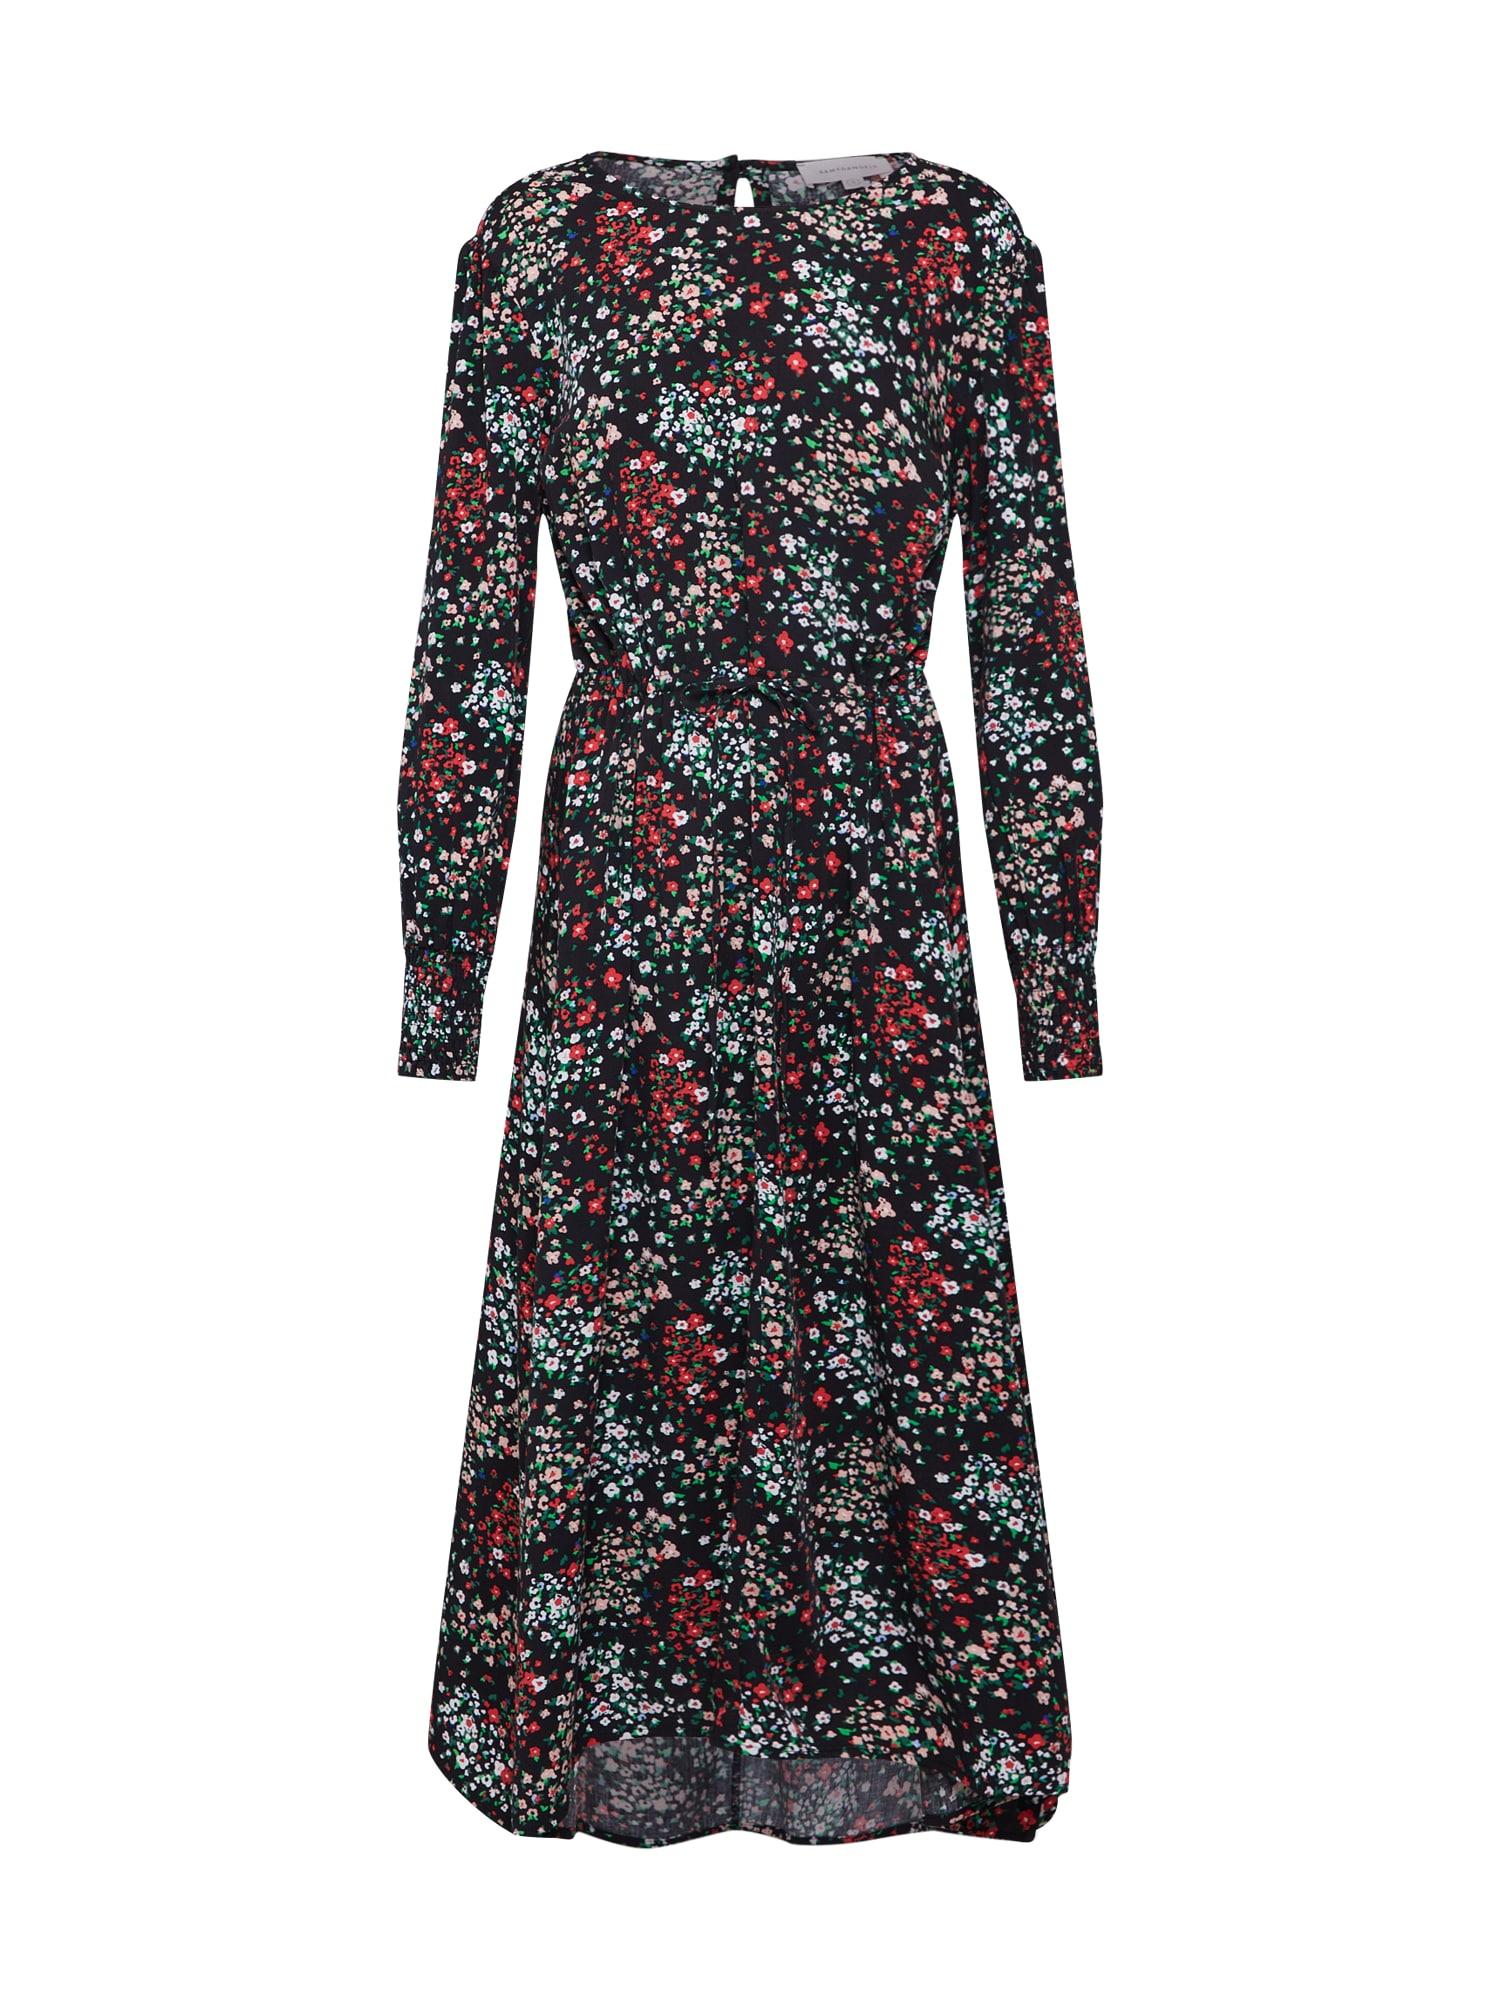 Šaty ROSAALIE MEADOW FLOWER mix barev černá ARMEDANGELS